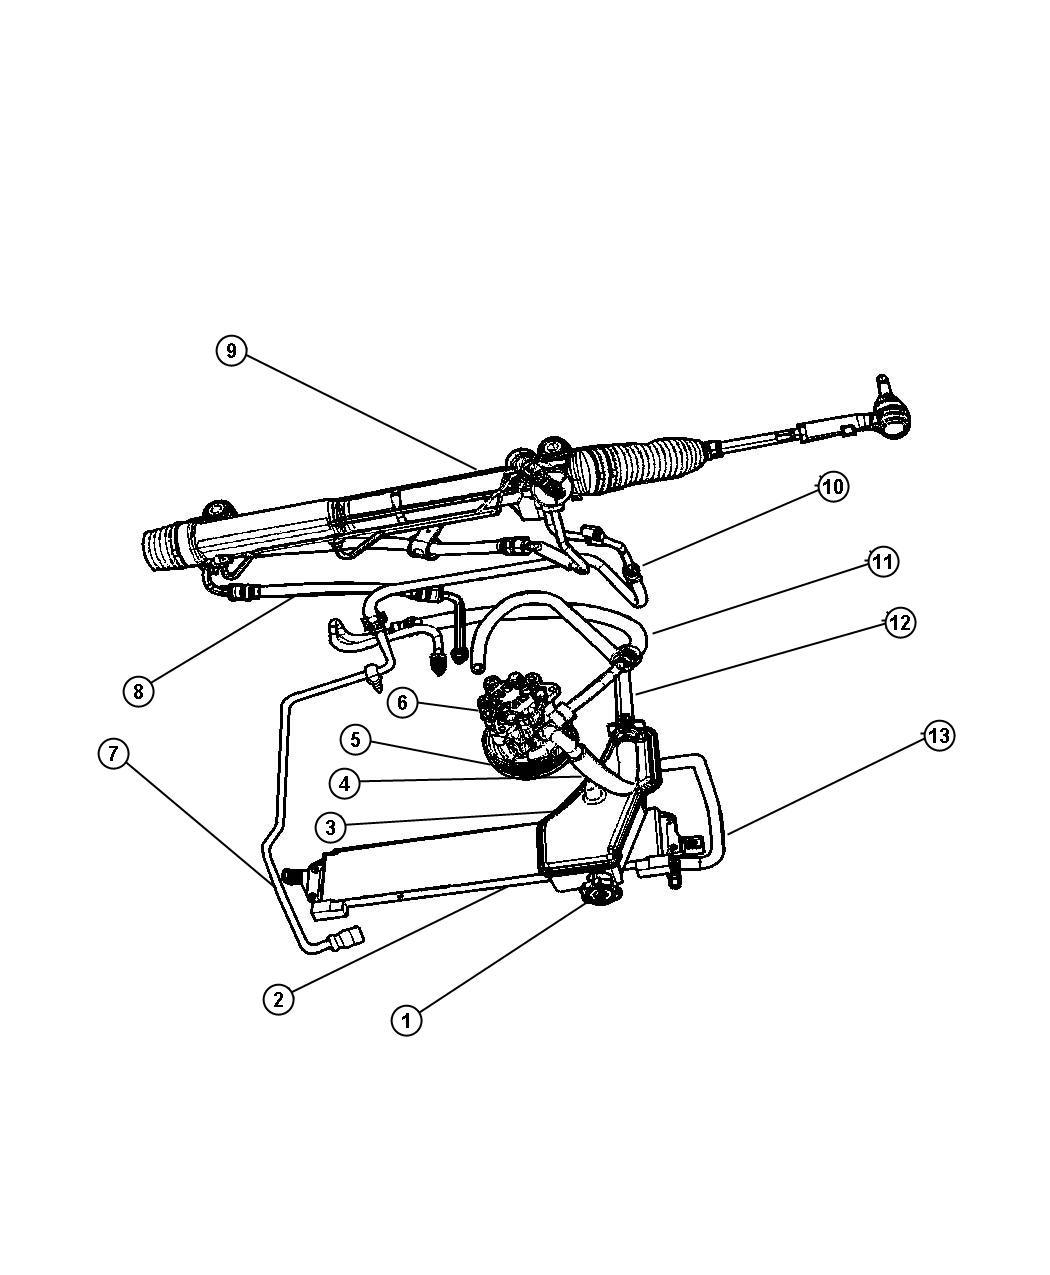 Jeep Commander Gear Power Steering Used For Rack